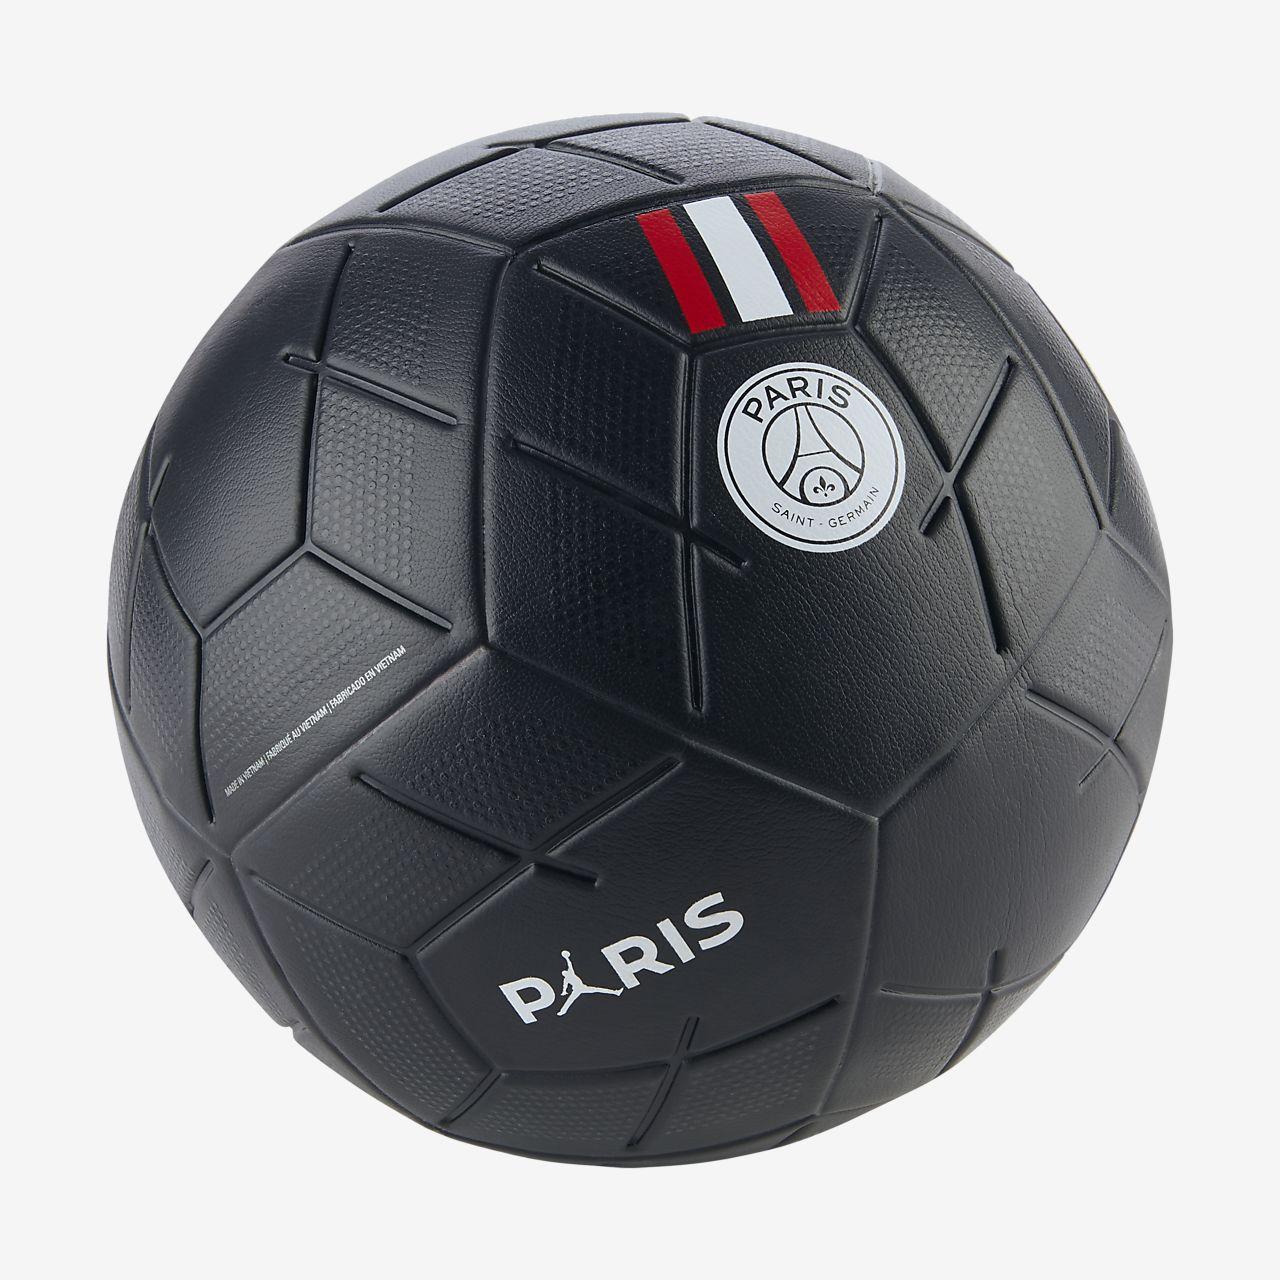 Balón de fútbol Paris Saint-Germain Magia. Nike.com MX 8d6e53ad85836